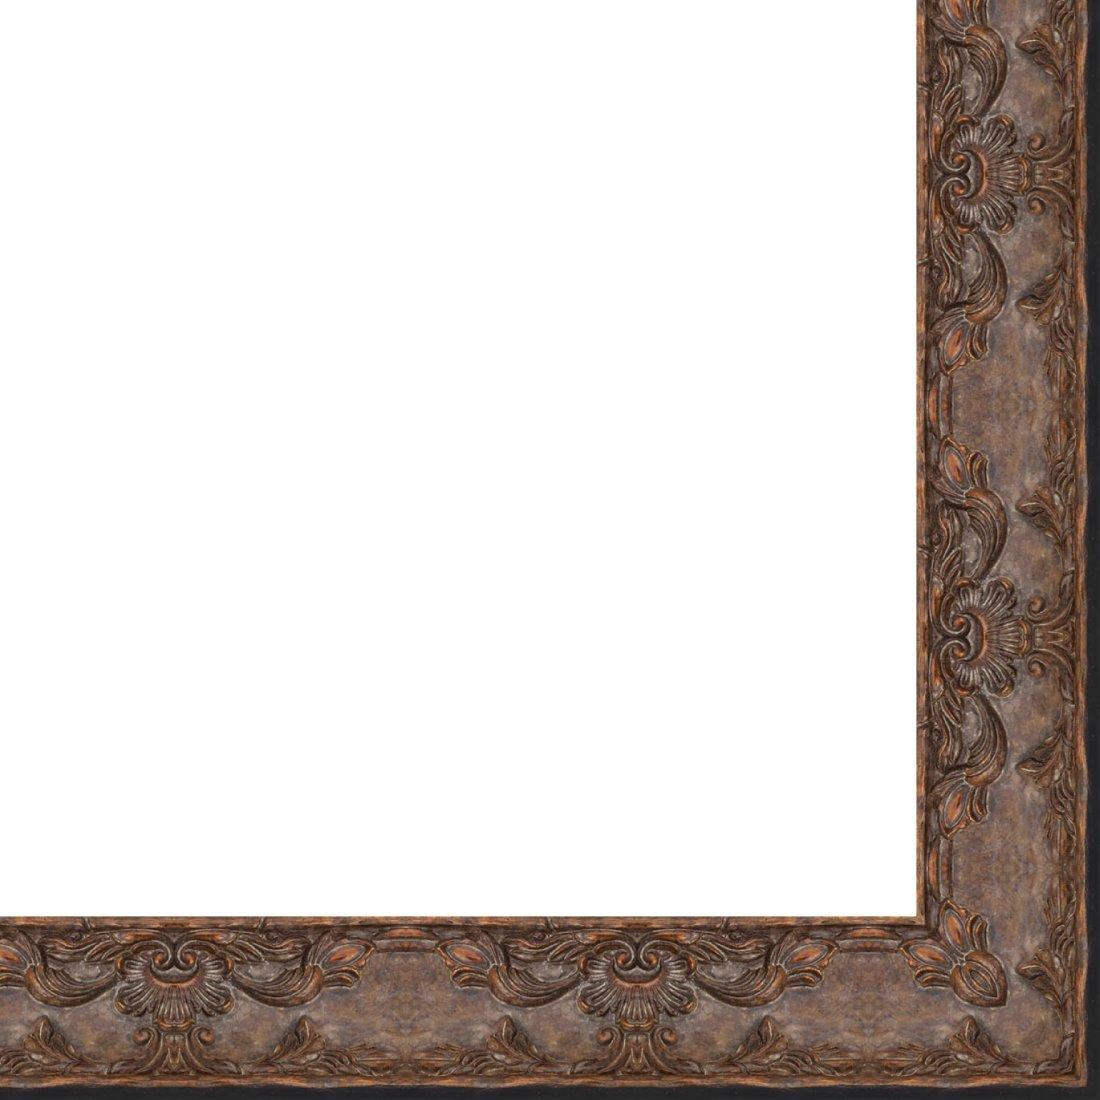 Picture Frame Moulding (Wood) 18ft bundle - Traditional Antique Gold Finish - 3.25'' width - 3/4'' rabbet depth